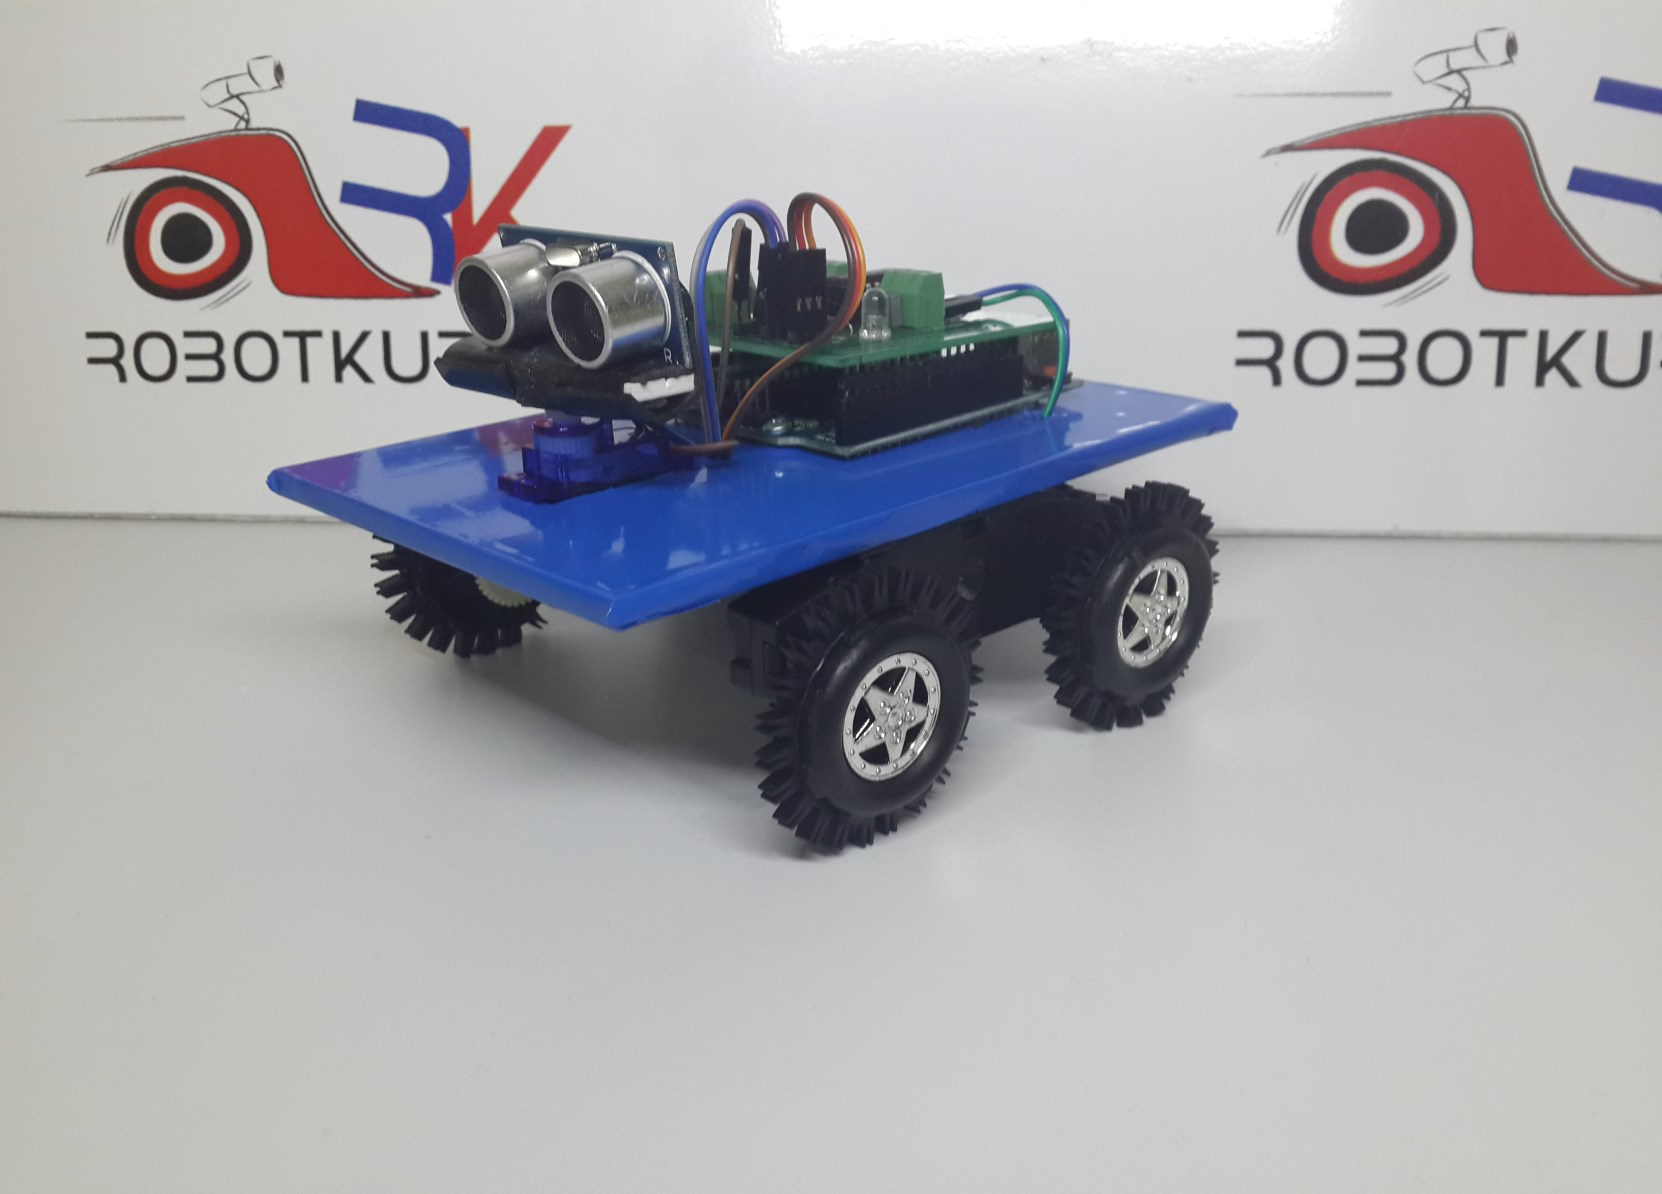 Bluetooth Kontrollü Ultrasonic Radarlı Robot